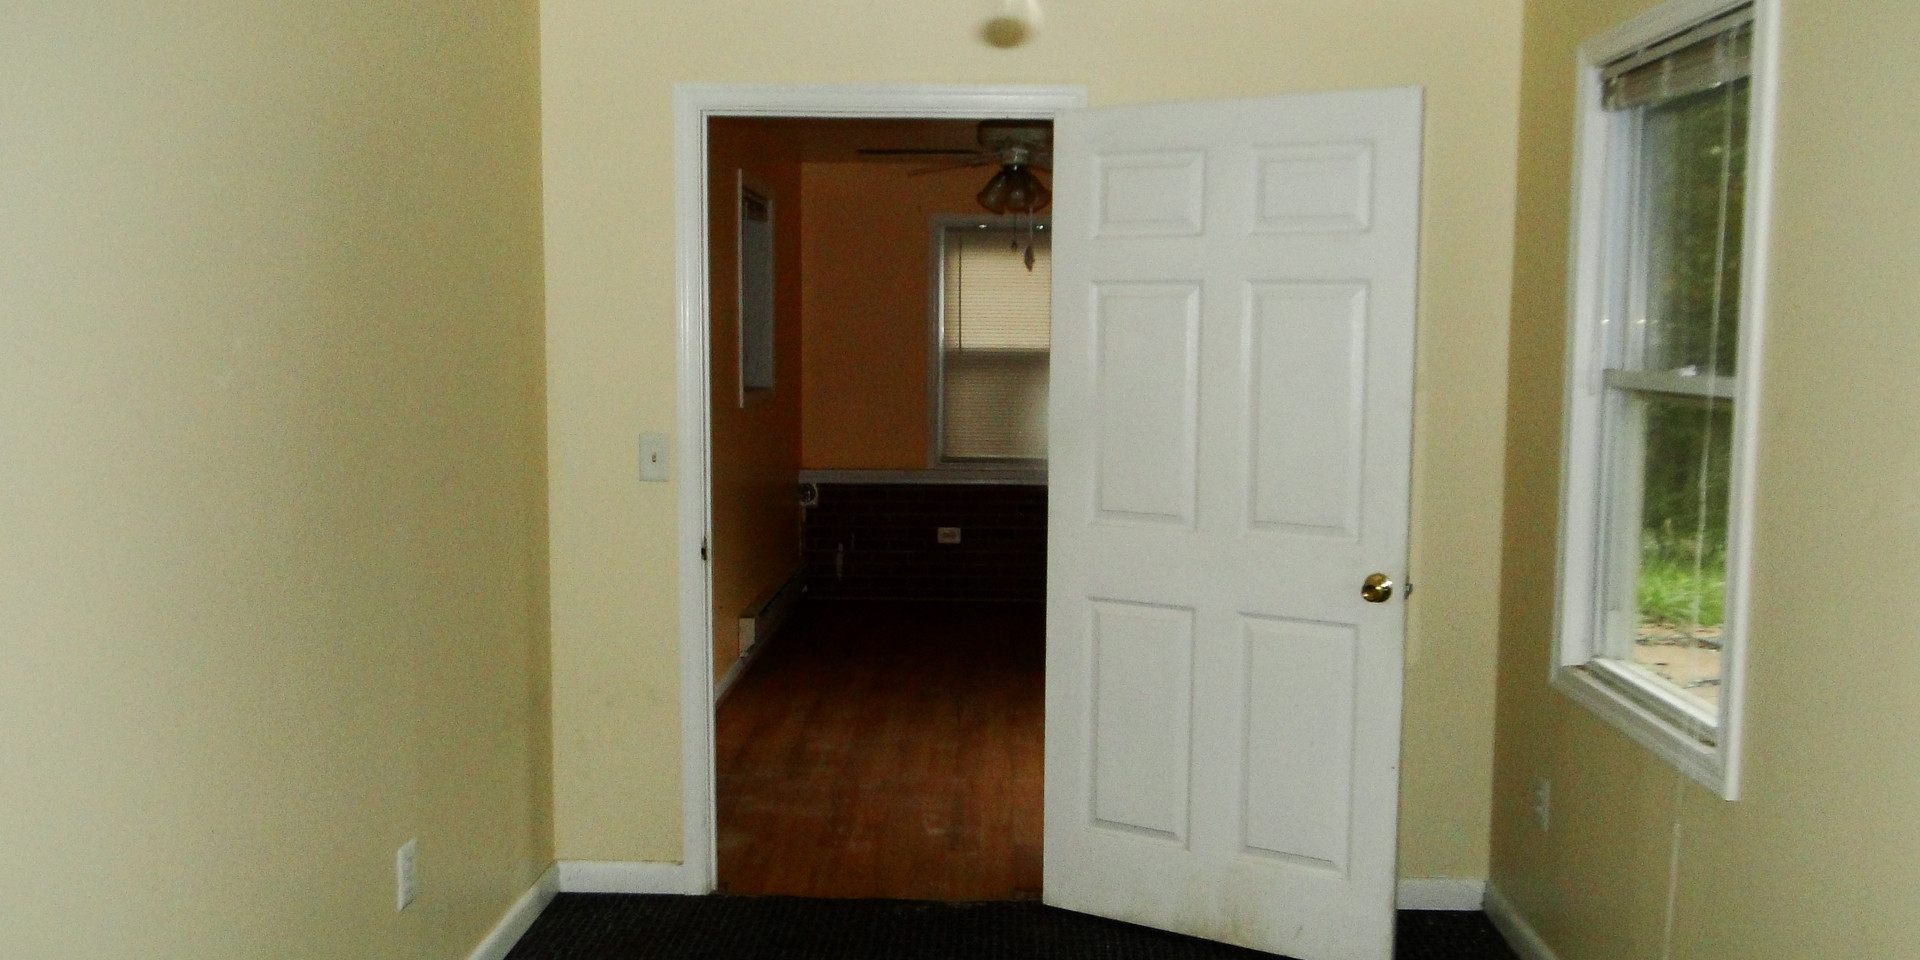 09 - First Bedroom 2.JPG